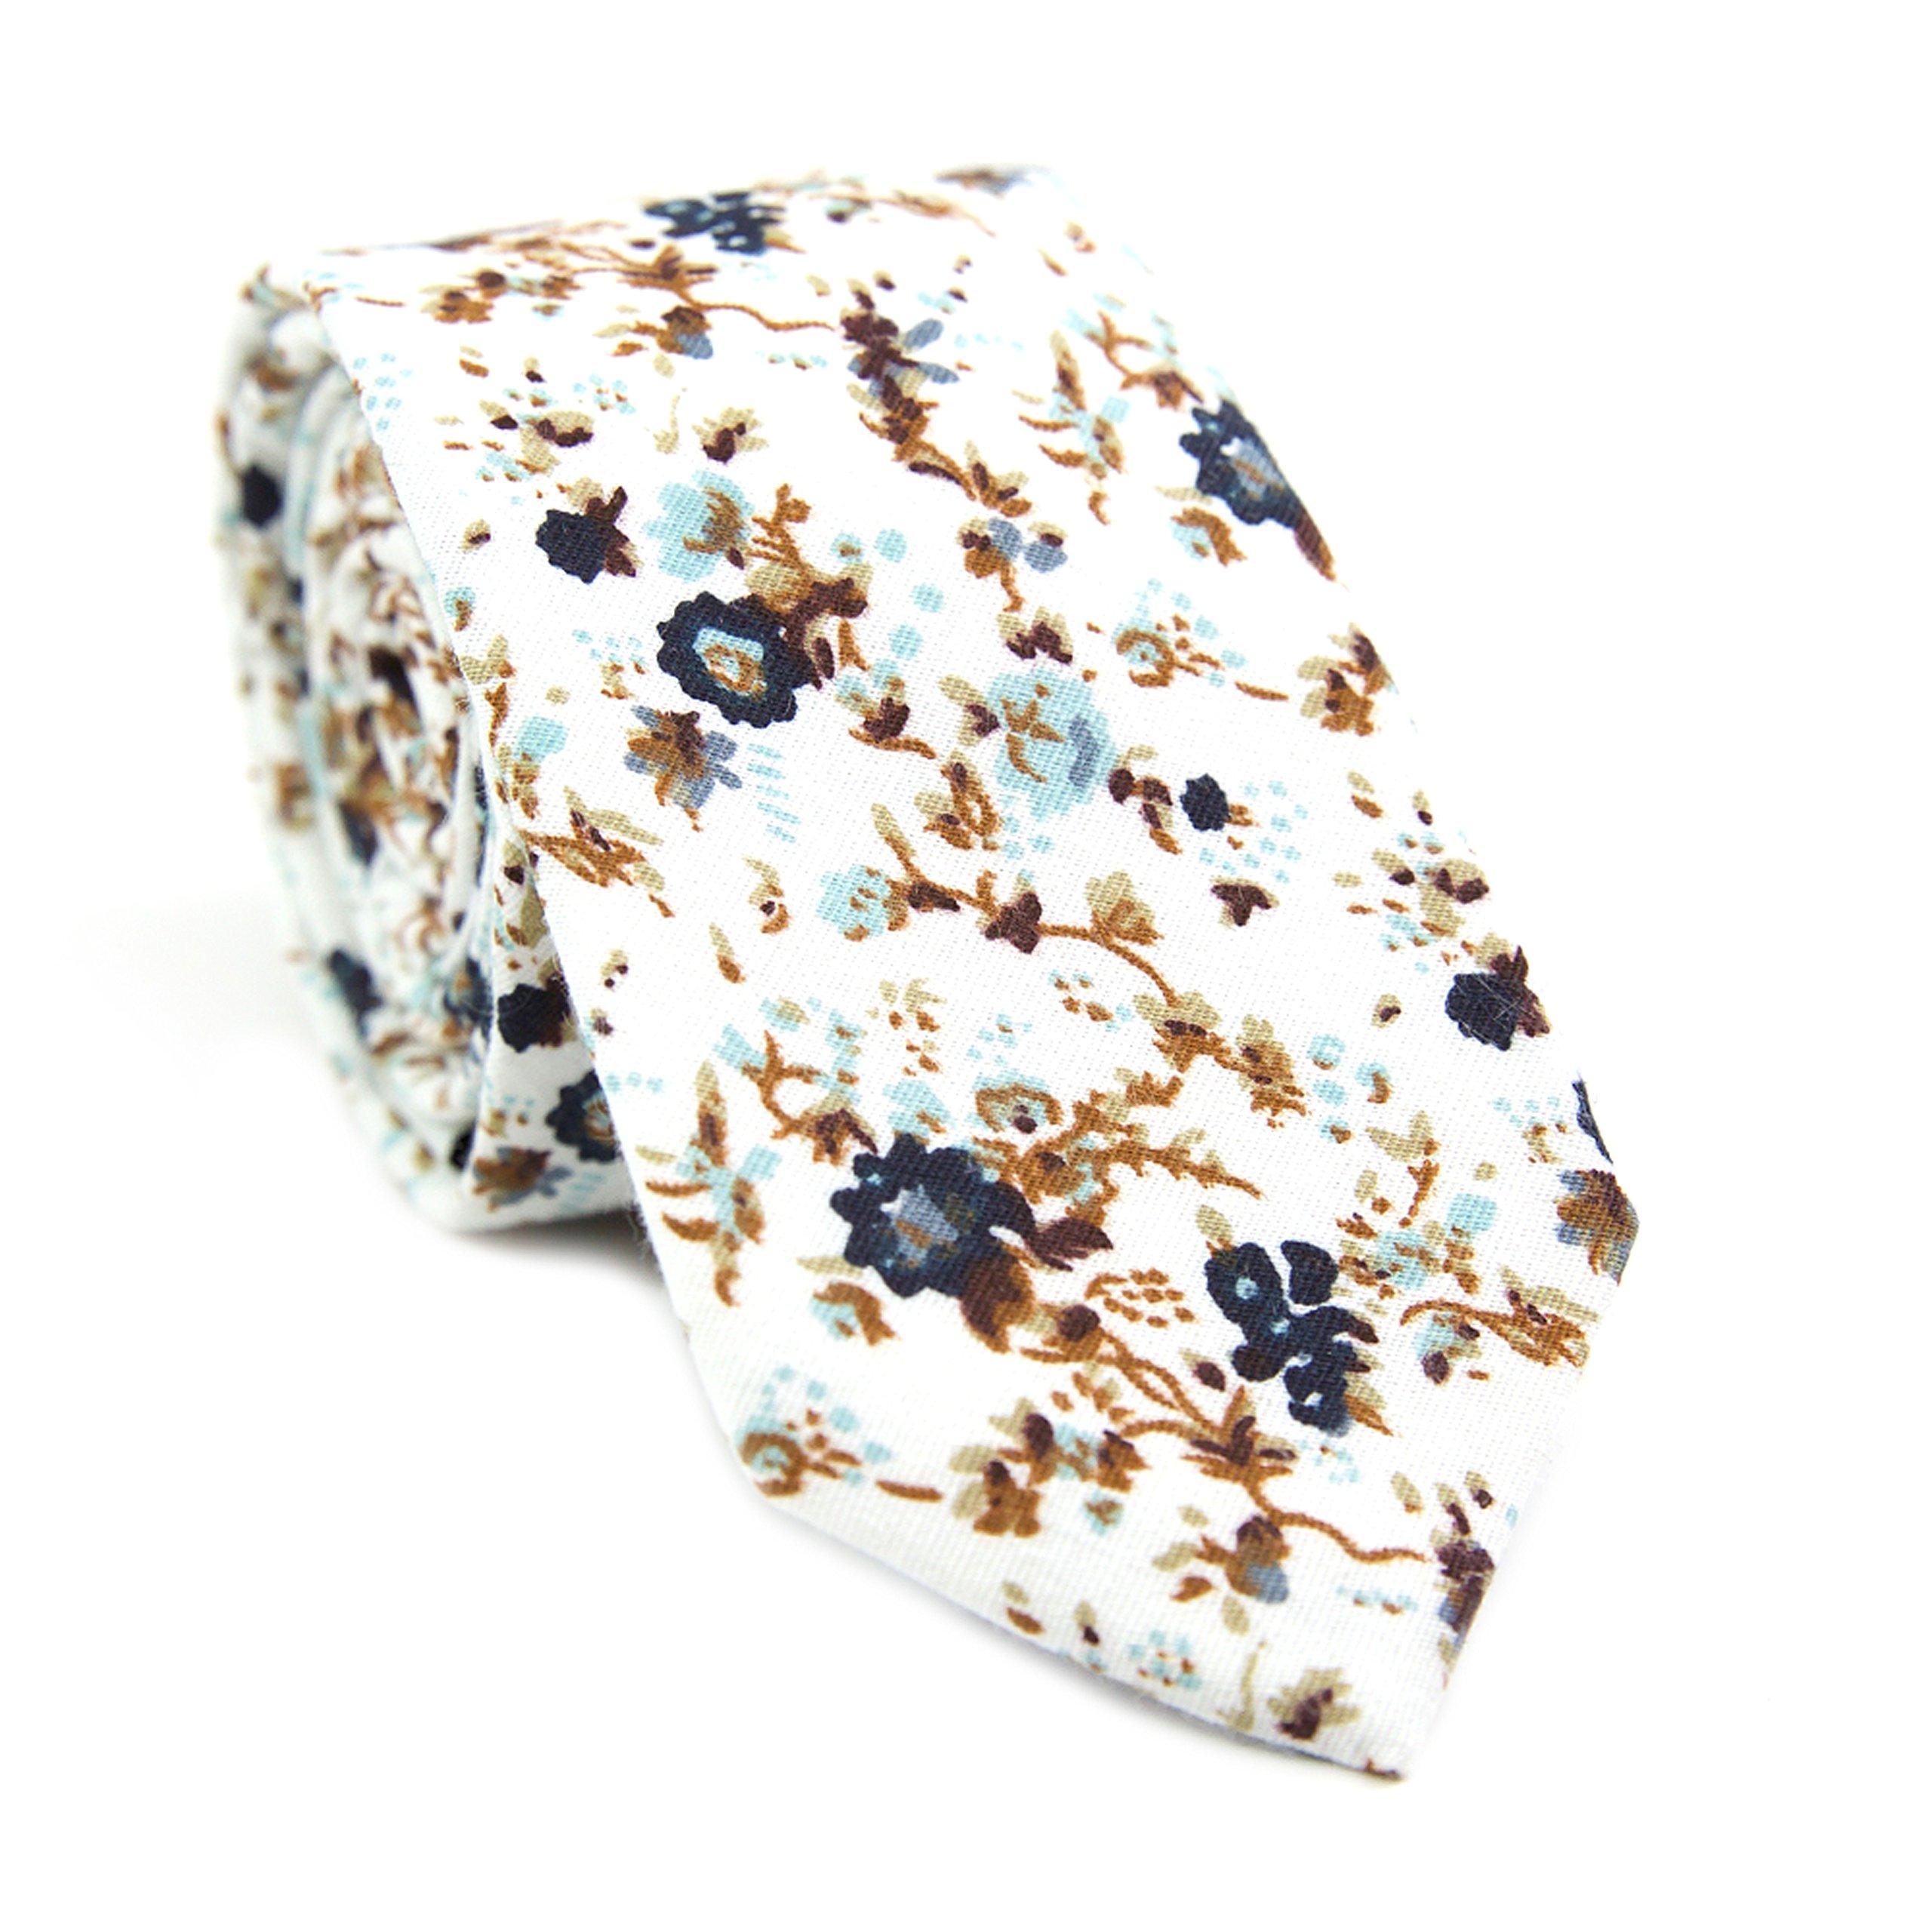 DAZI Men's Skinny Tie Floral Print Cotton Necktie, Great for Weddings, Groom, Groomsmen, Missions, Dances, Gifts. (Blue Bloom) by DAZI (Image #1)